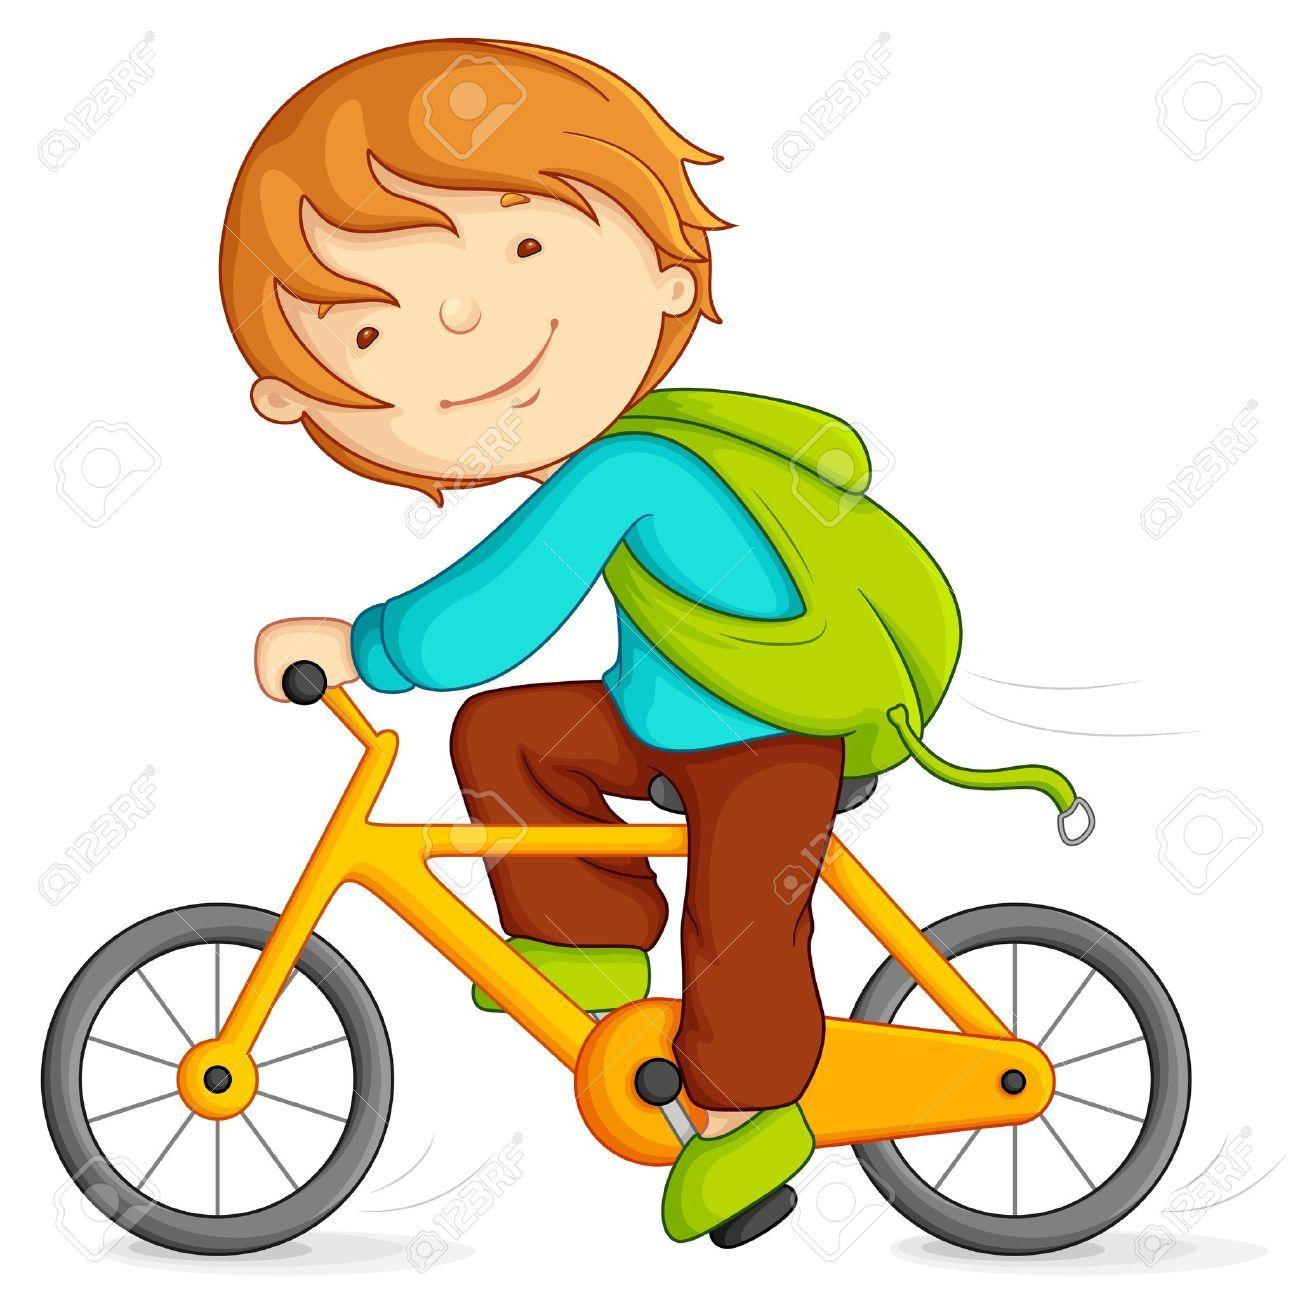 Image Result For Cartoon Cyclist Dibujos Bonitos Bicicletas Ninos Bicicleta Dibujo